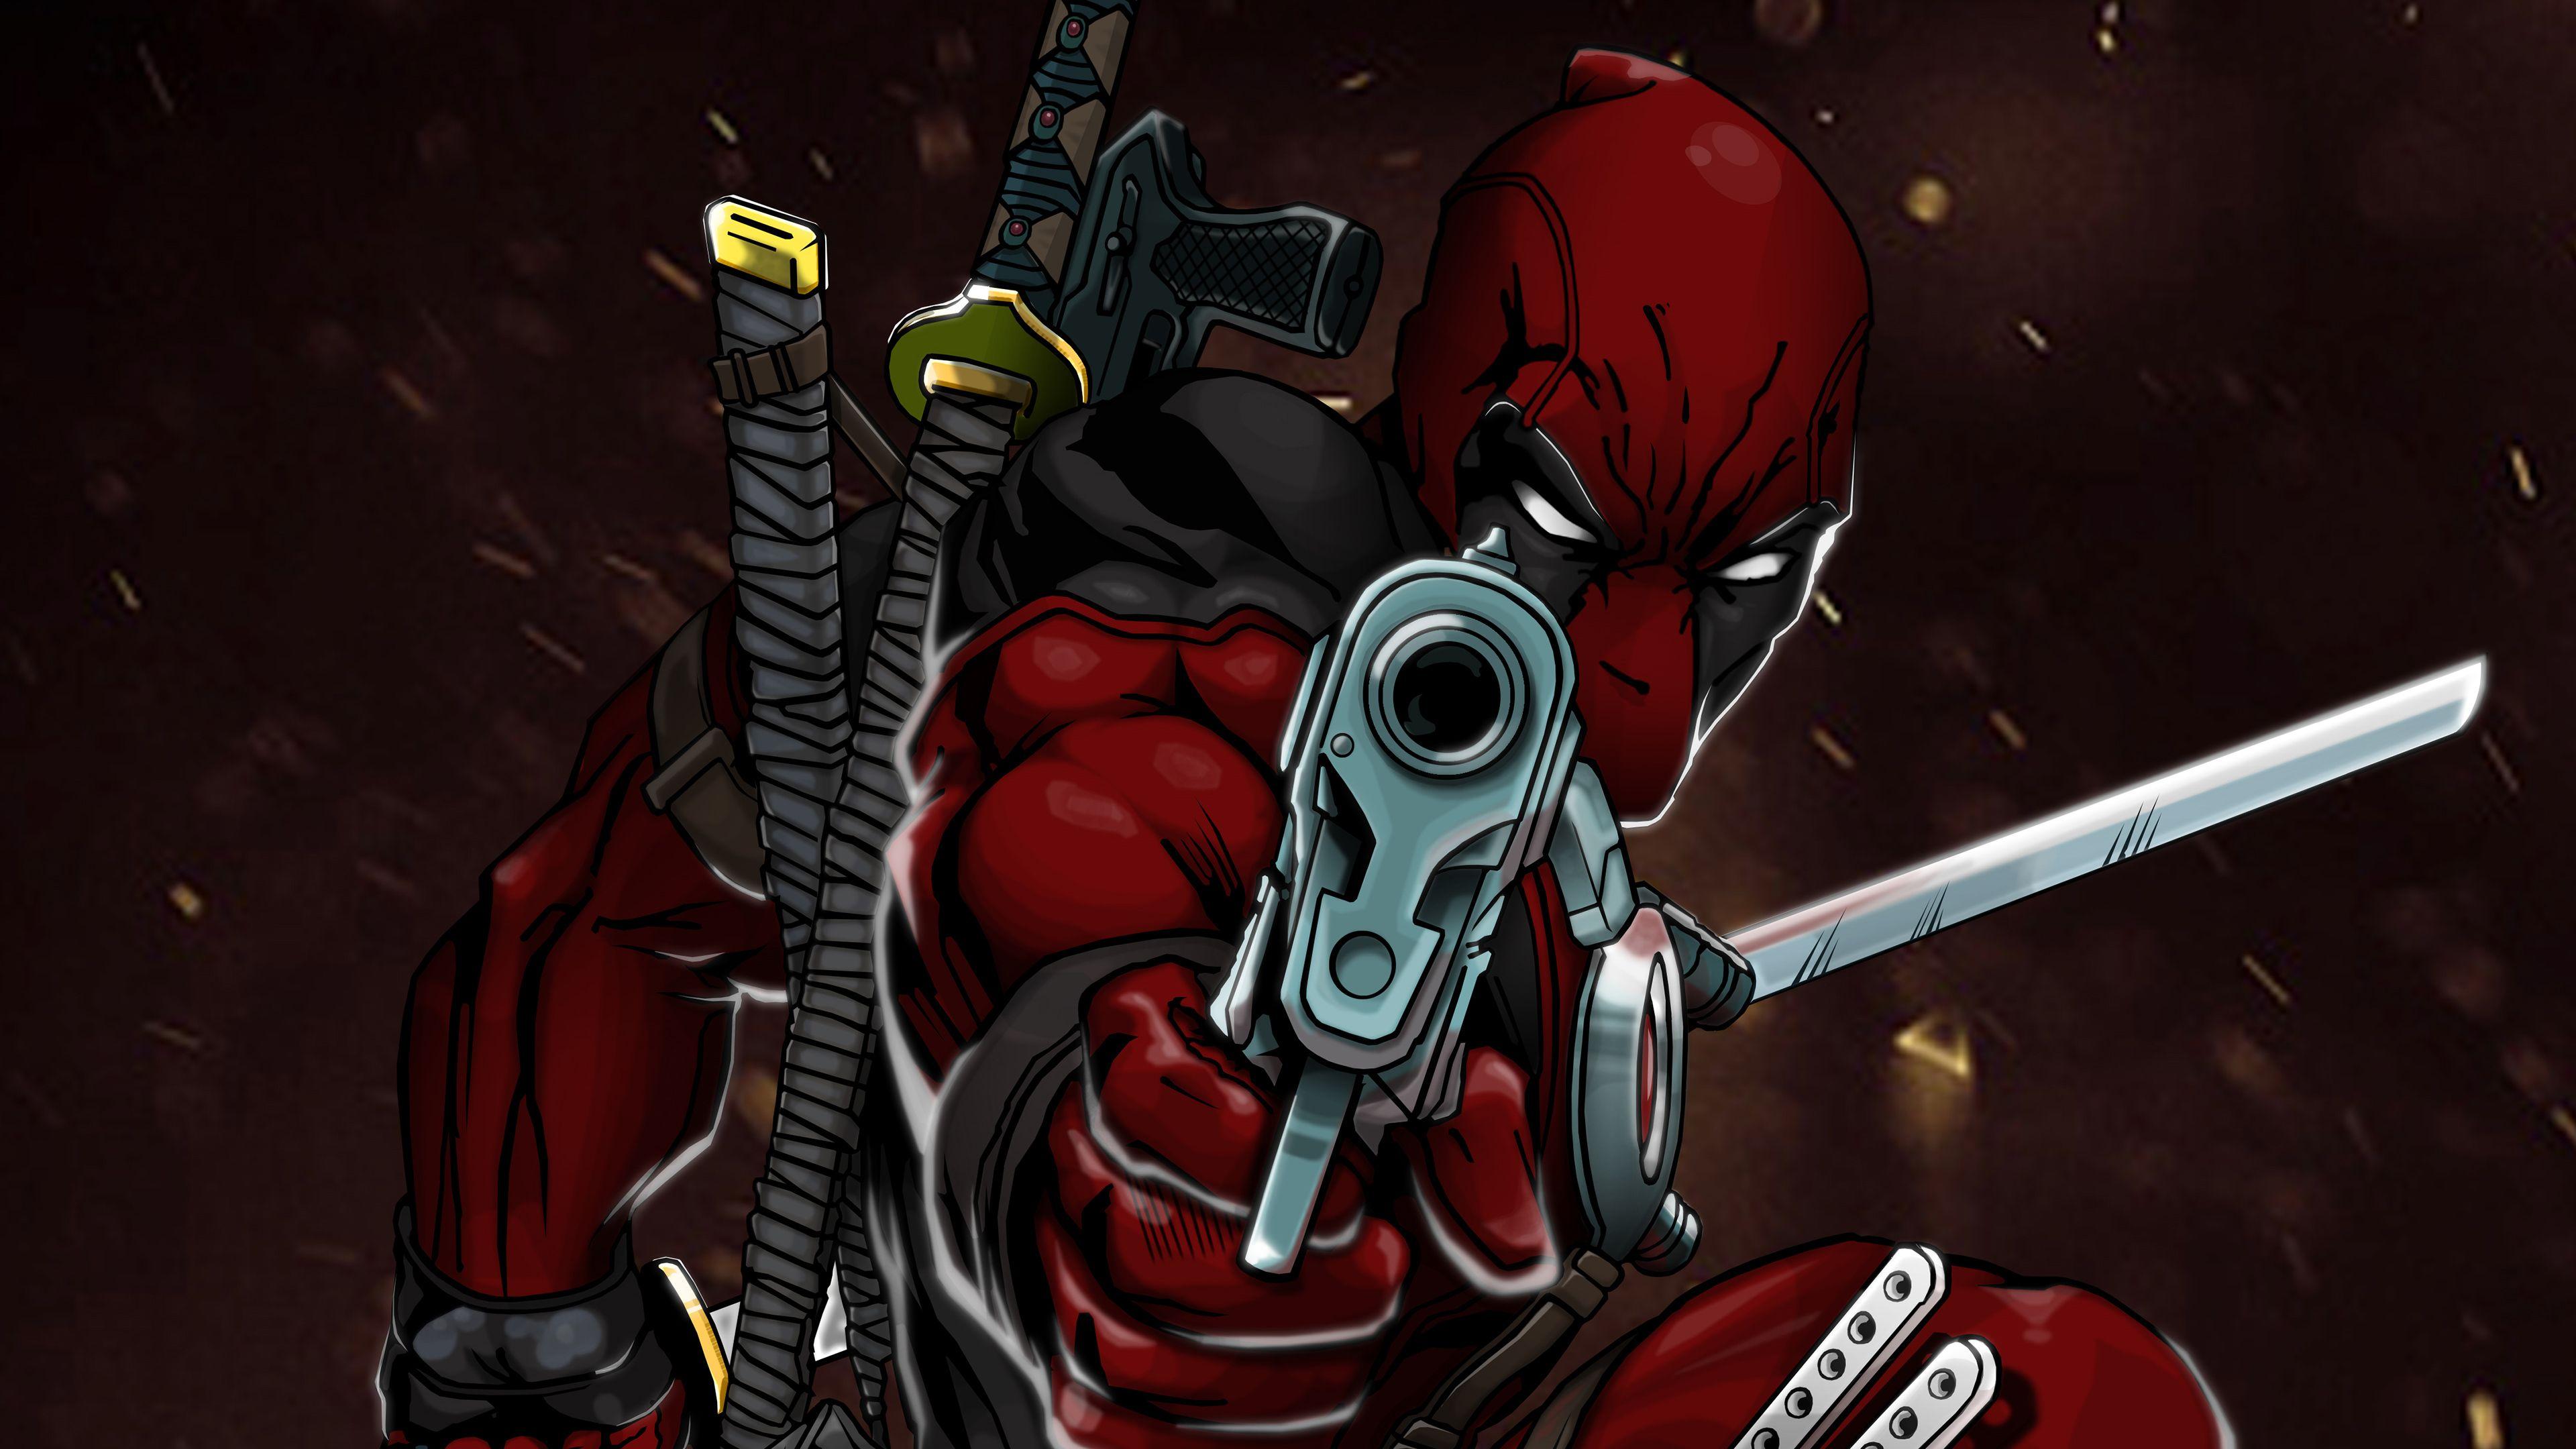 Deadpool 4k Art Superheroes Wallpapers Hd Wallpapers Digital Art Wallpapers Deadpool Wallpapers Behance Wallpape Deadpool Wallpaper Art Wallpaper Superhero